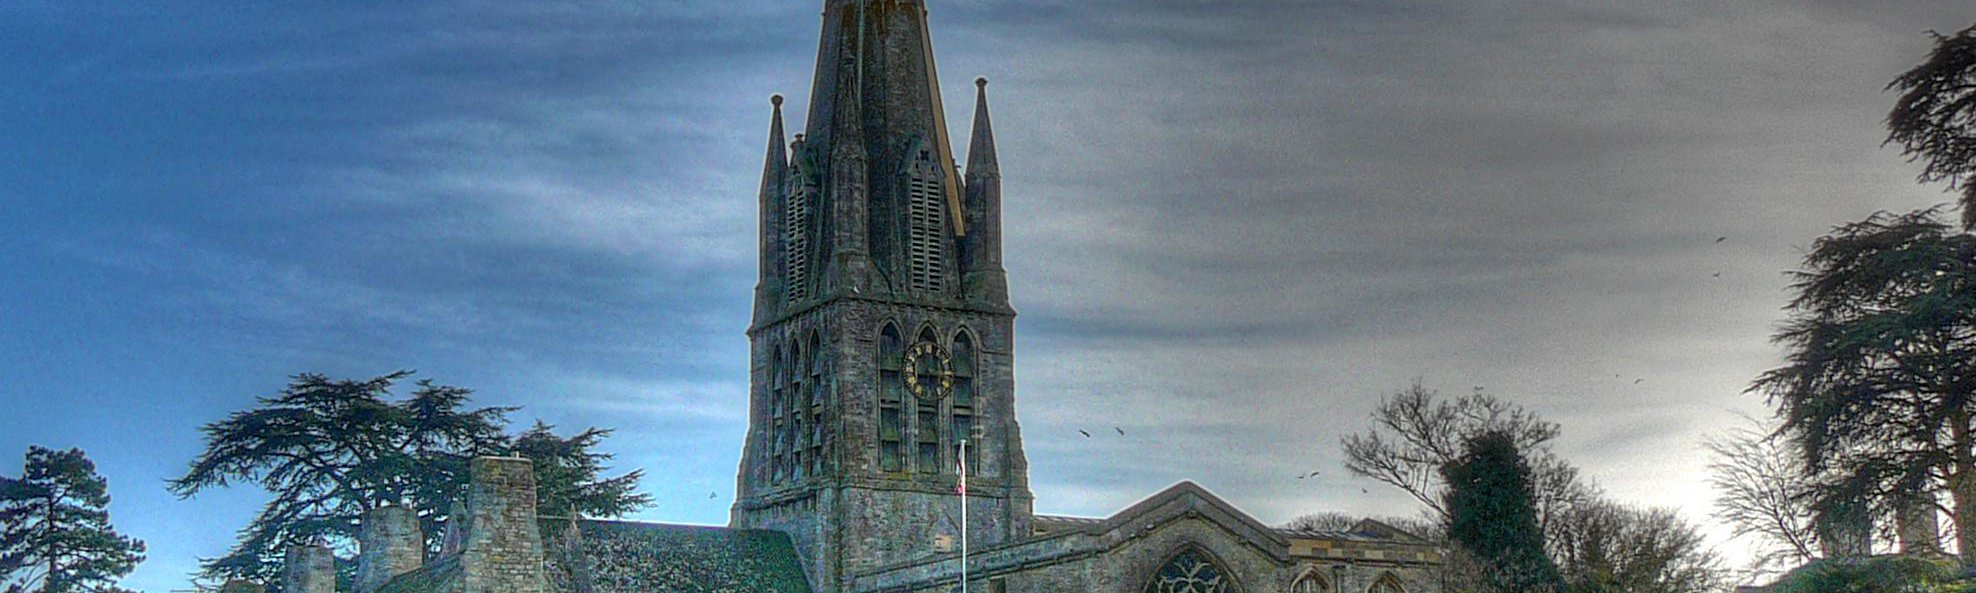 St. Mary's Church, Witney